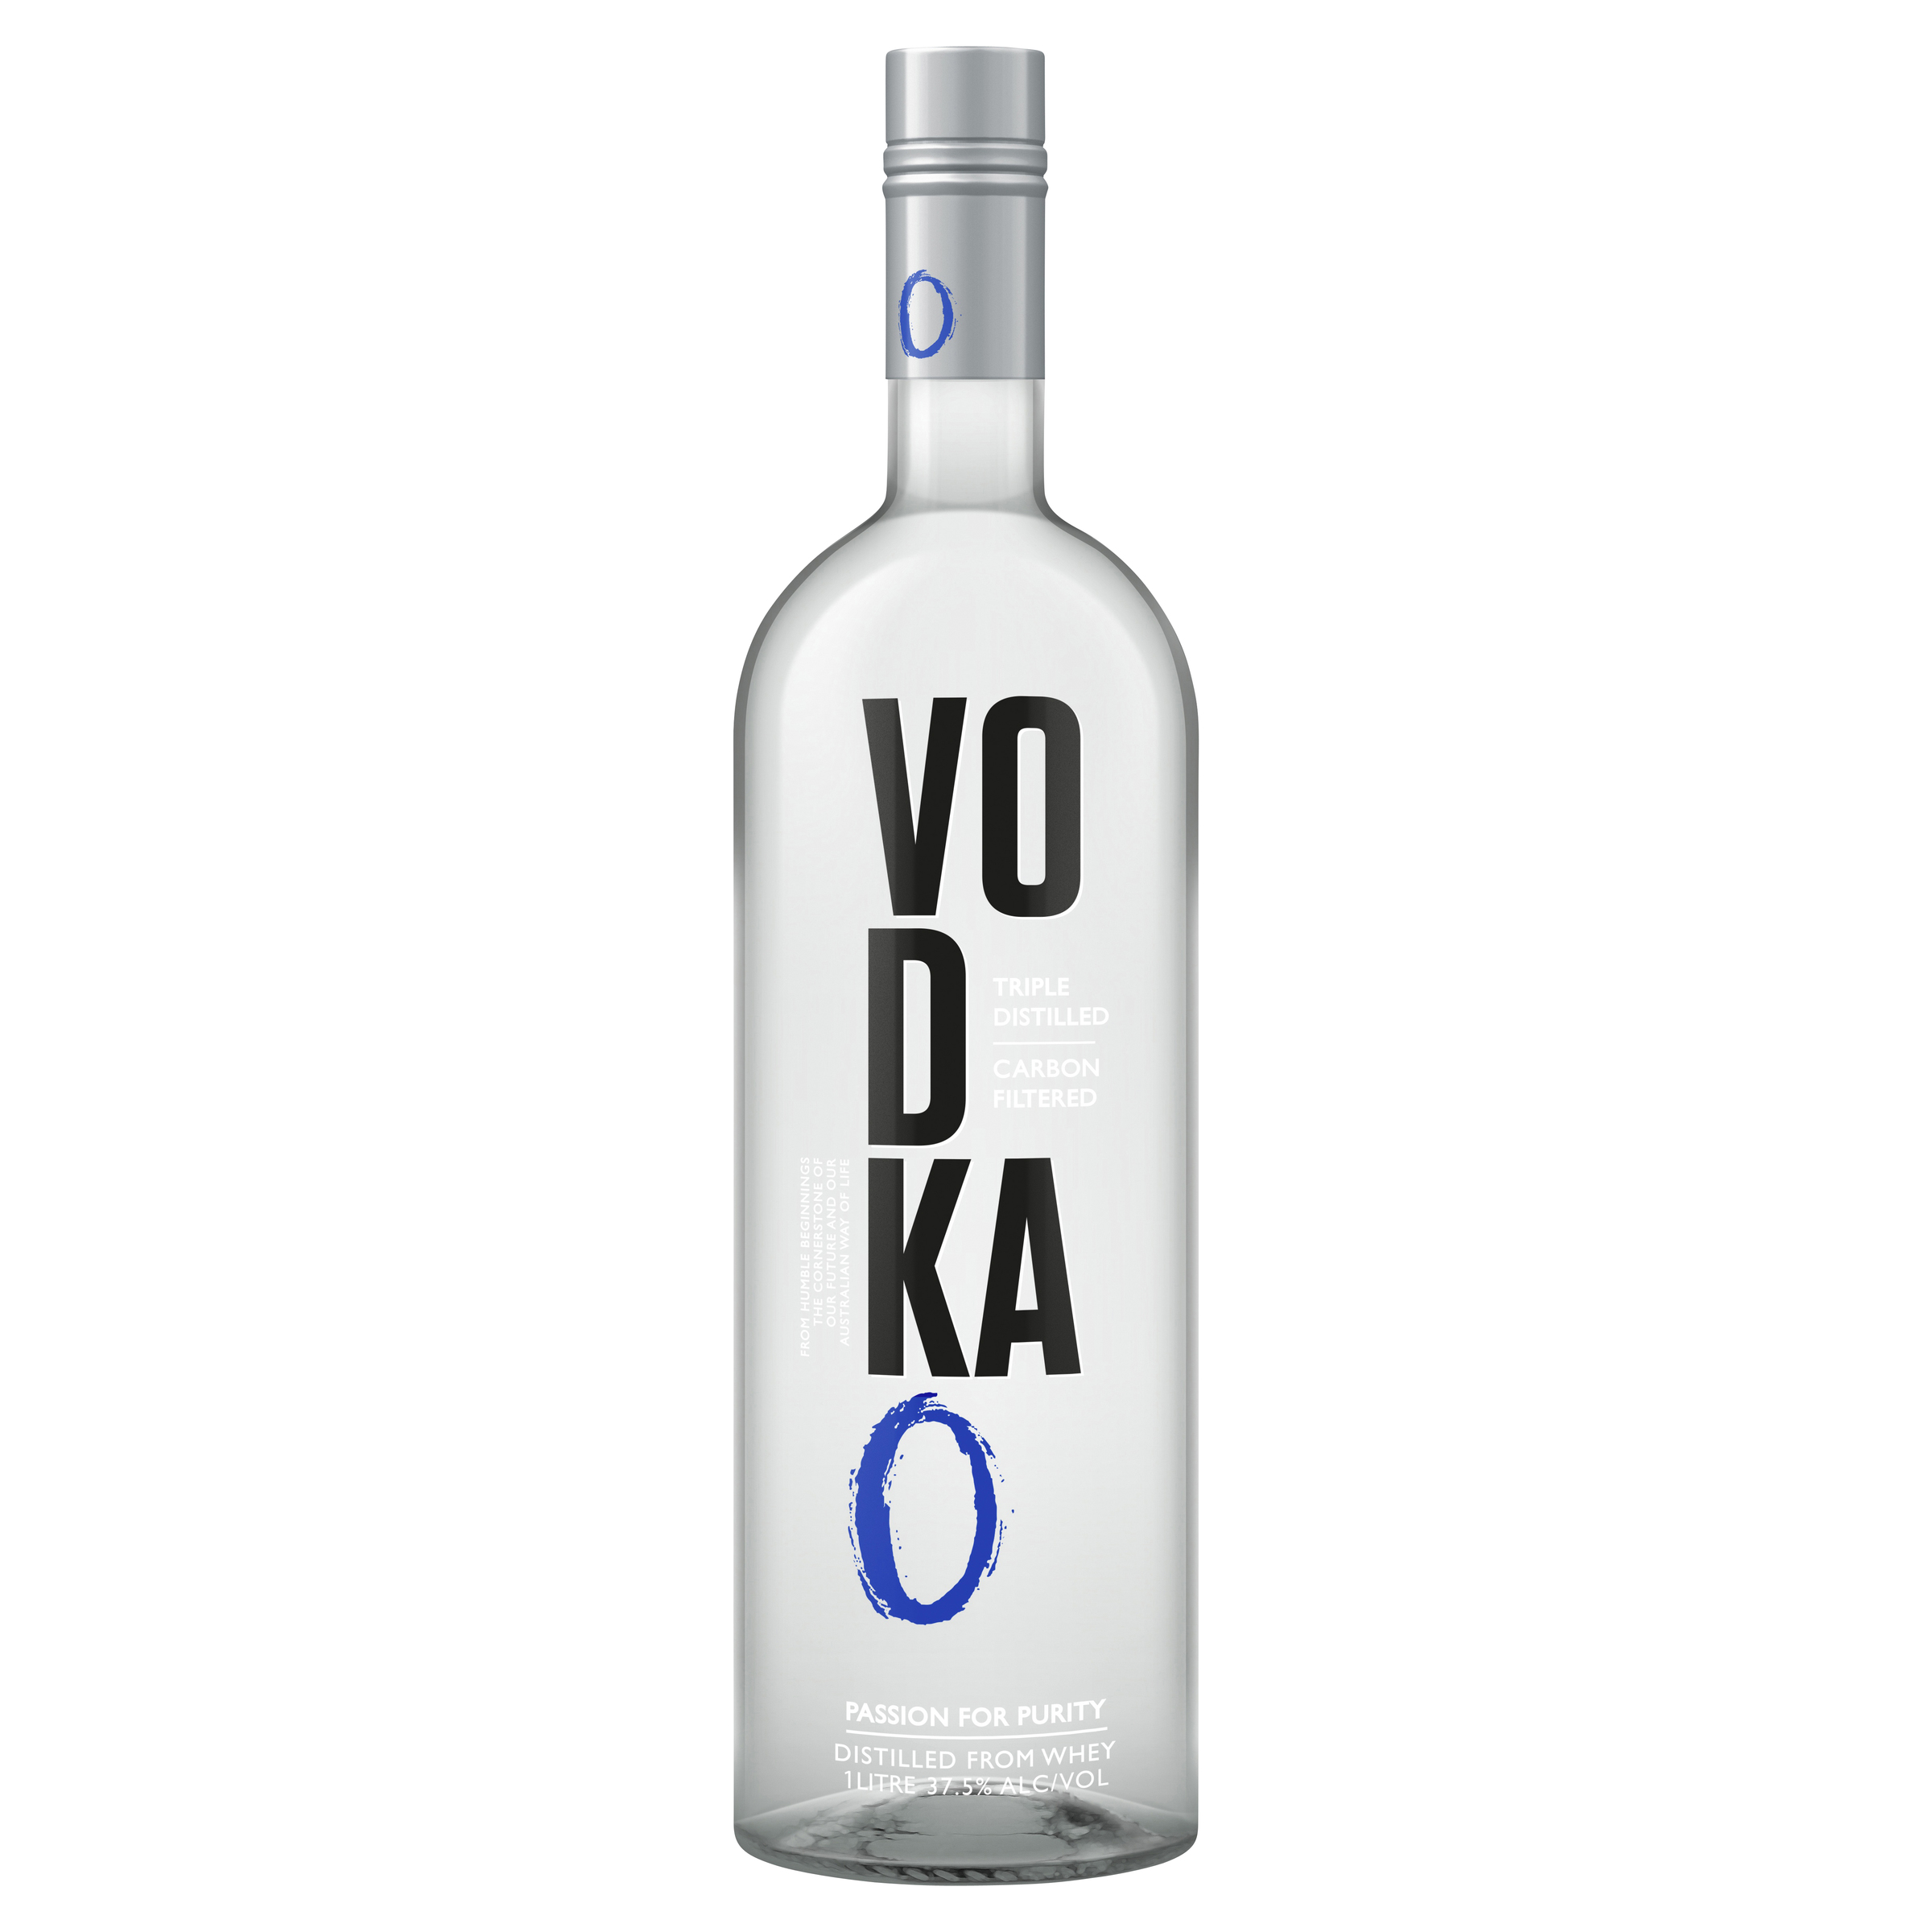 Бутылка водки в картинках